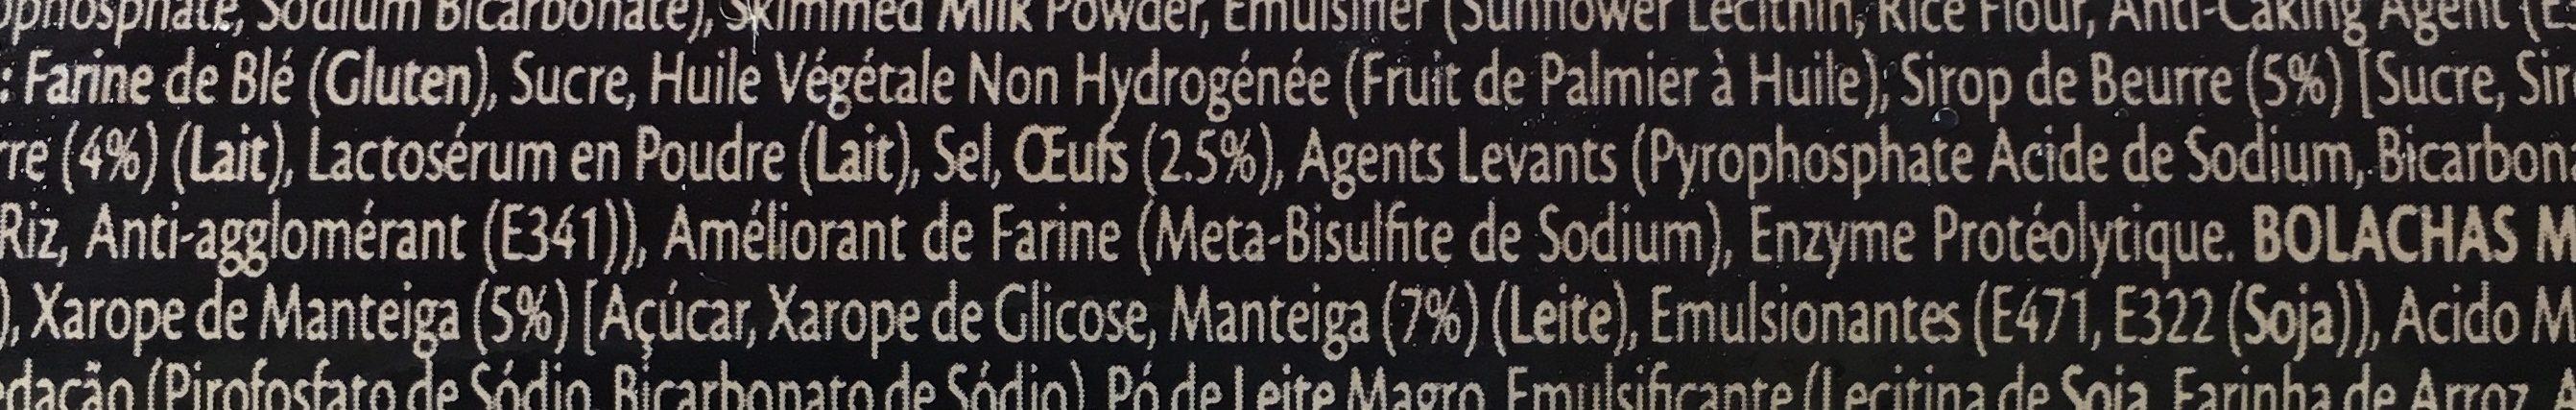 Blue Label Marie Biscuits - Ingredients - fr